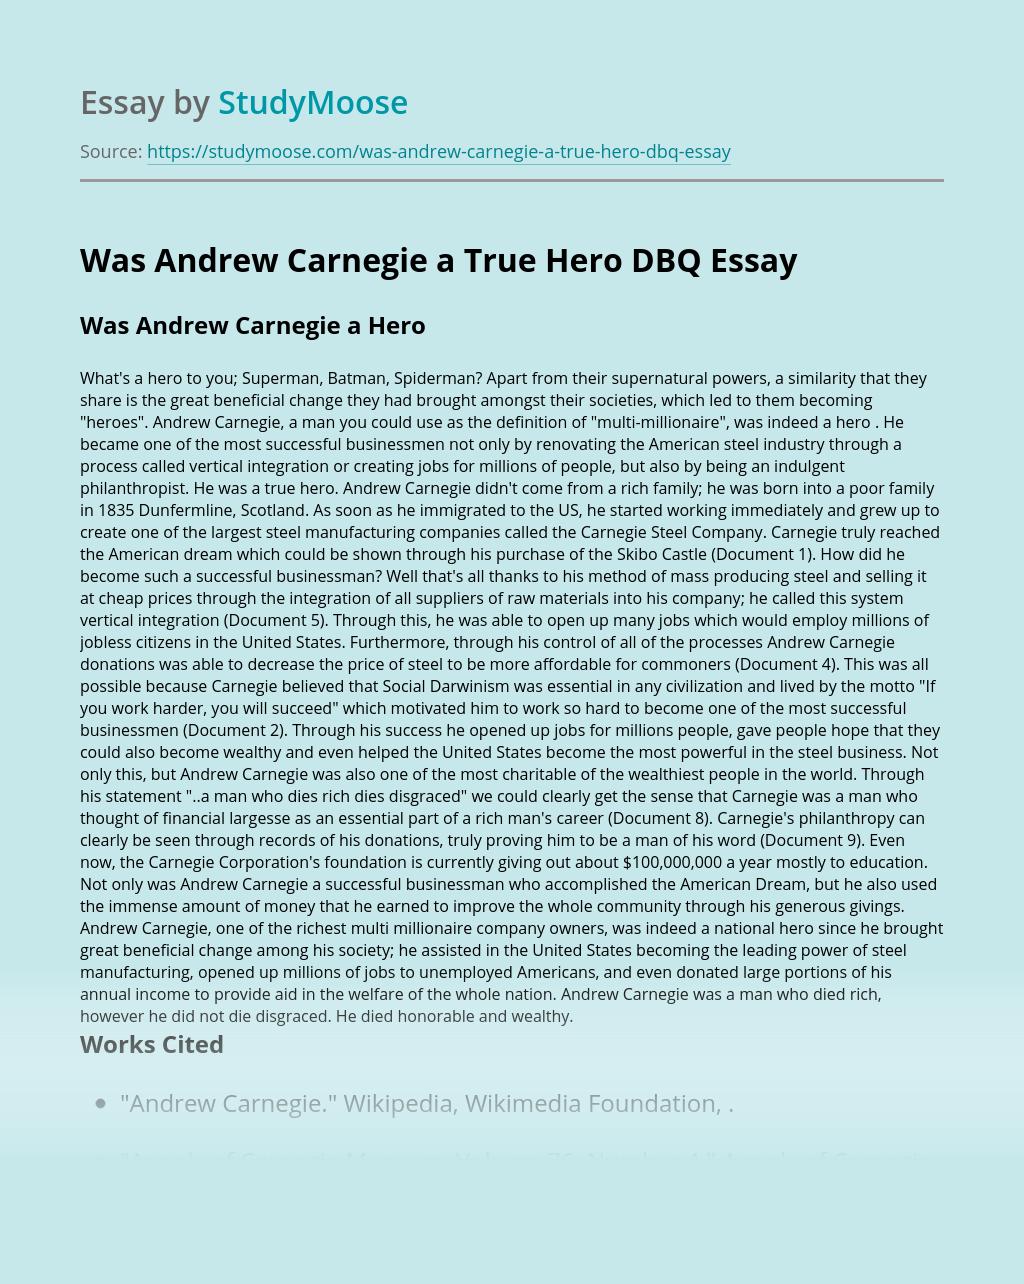 Was Andrew Carnegie a True Hero DBQ